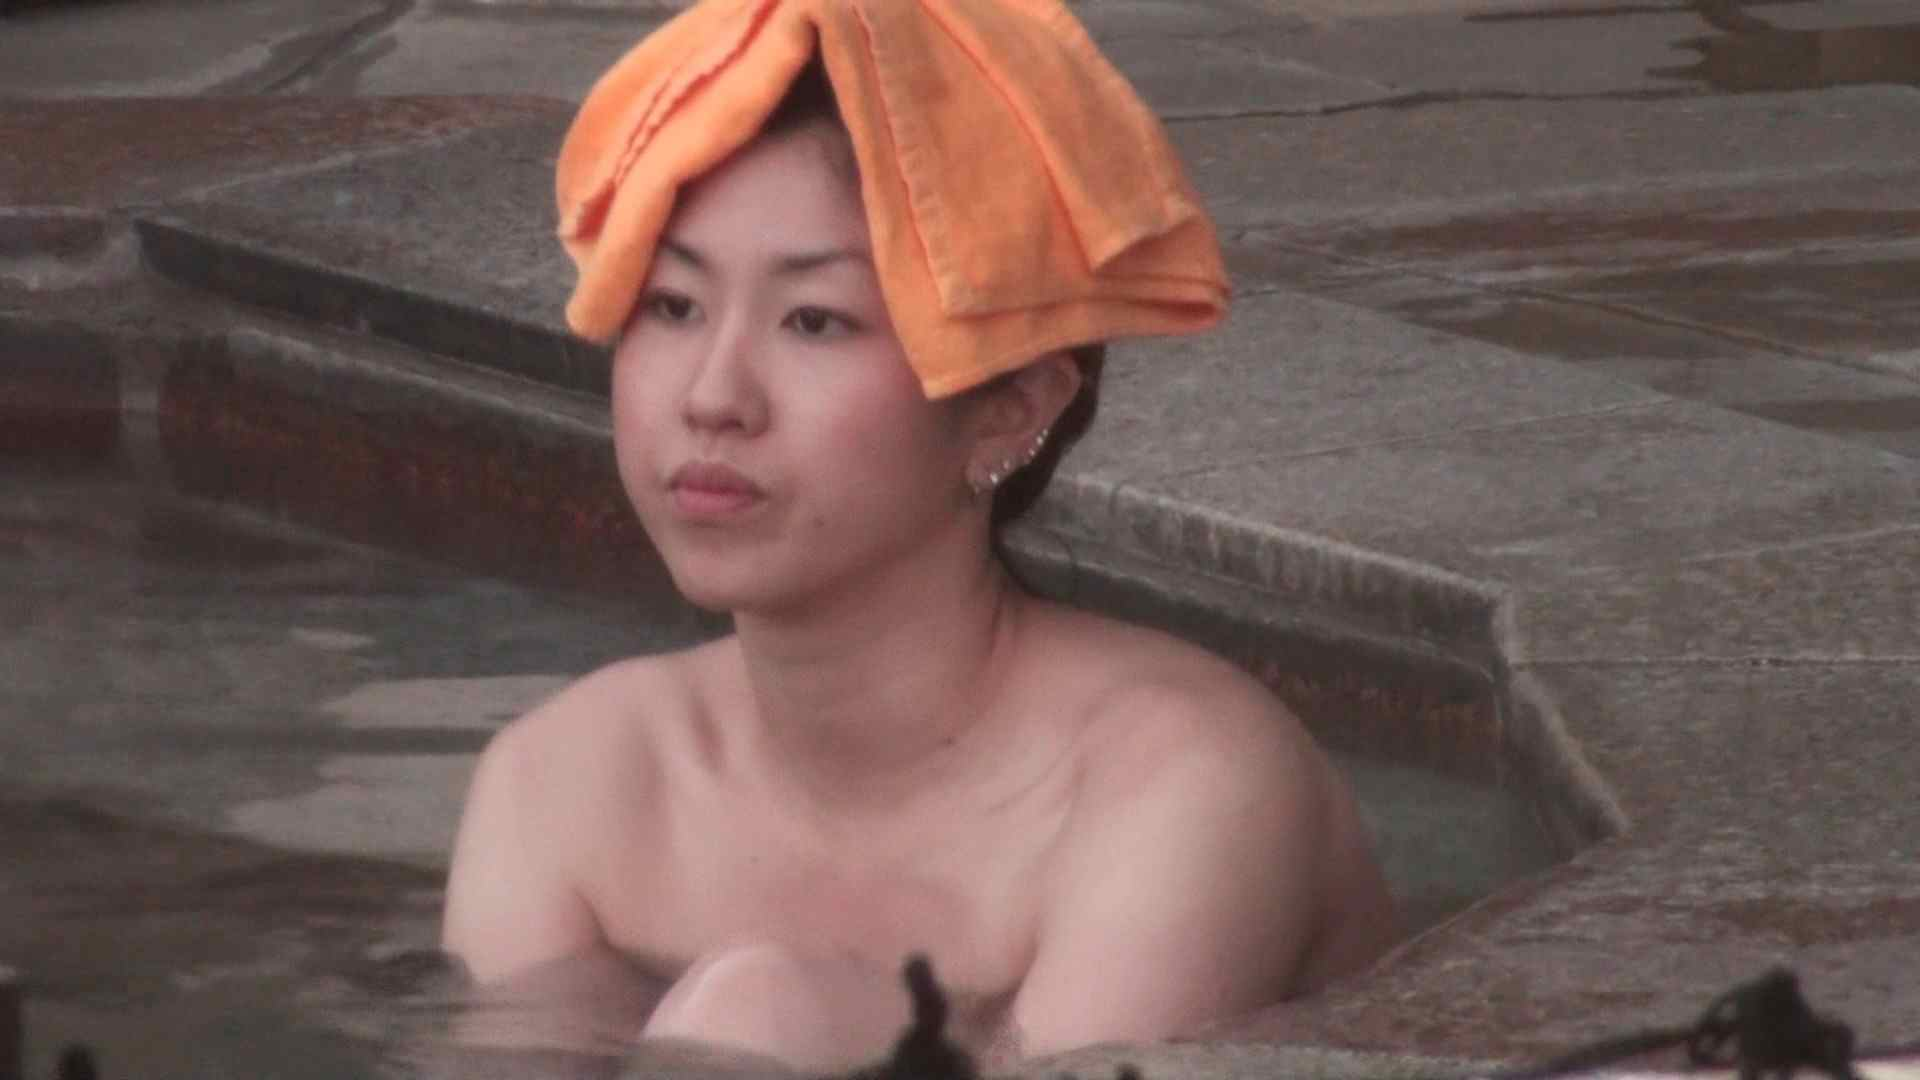 Aquaな露天風呂Vol.135 盗撮師作品 | 露天風呂突入  105pic 103